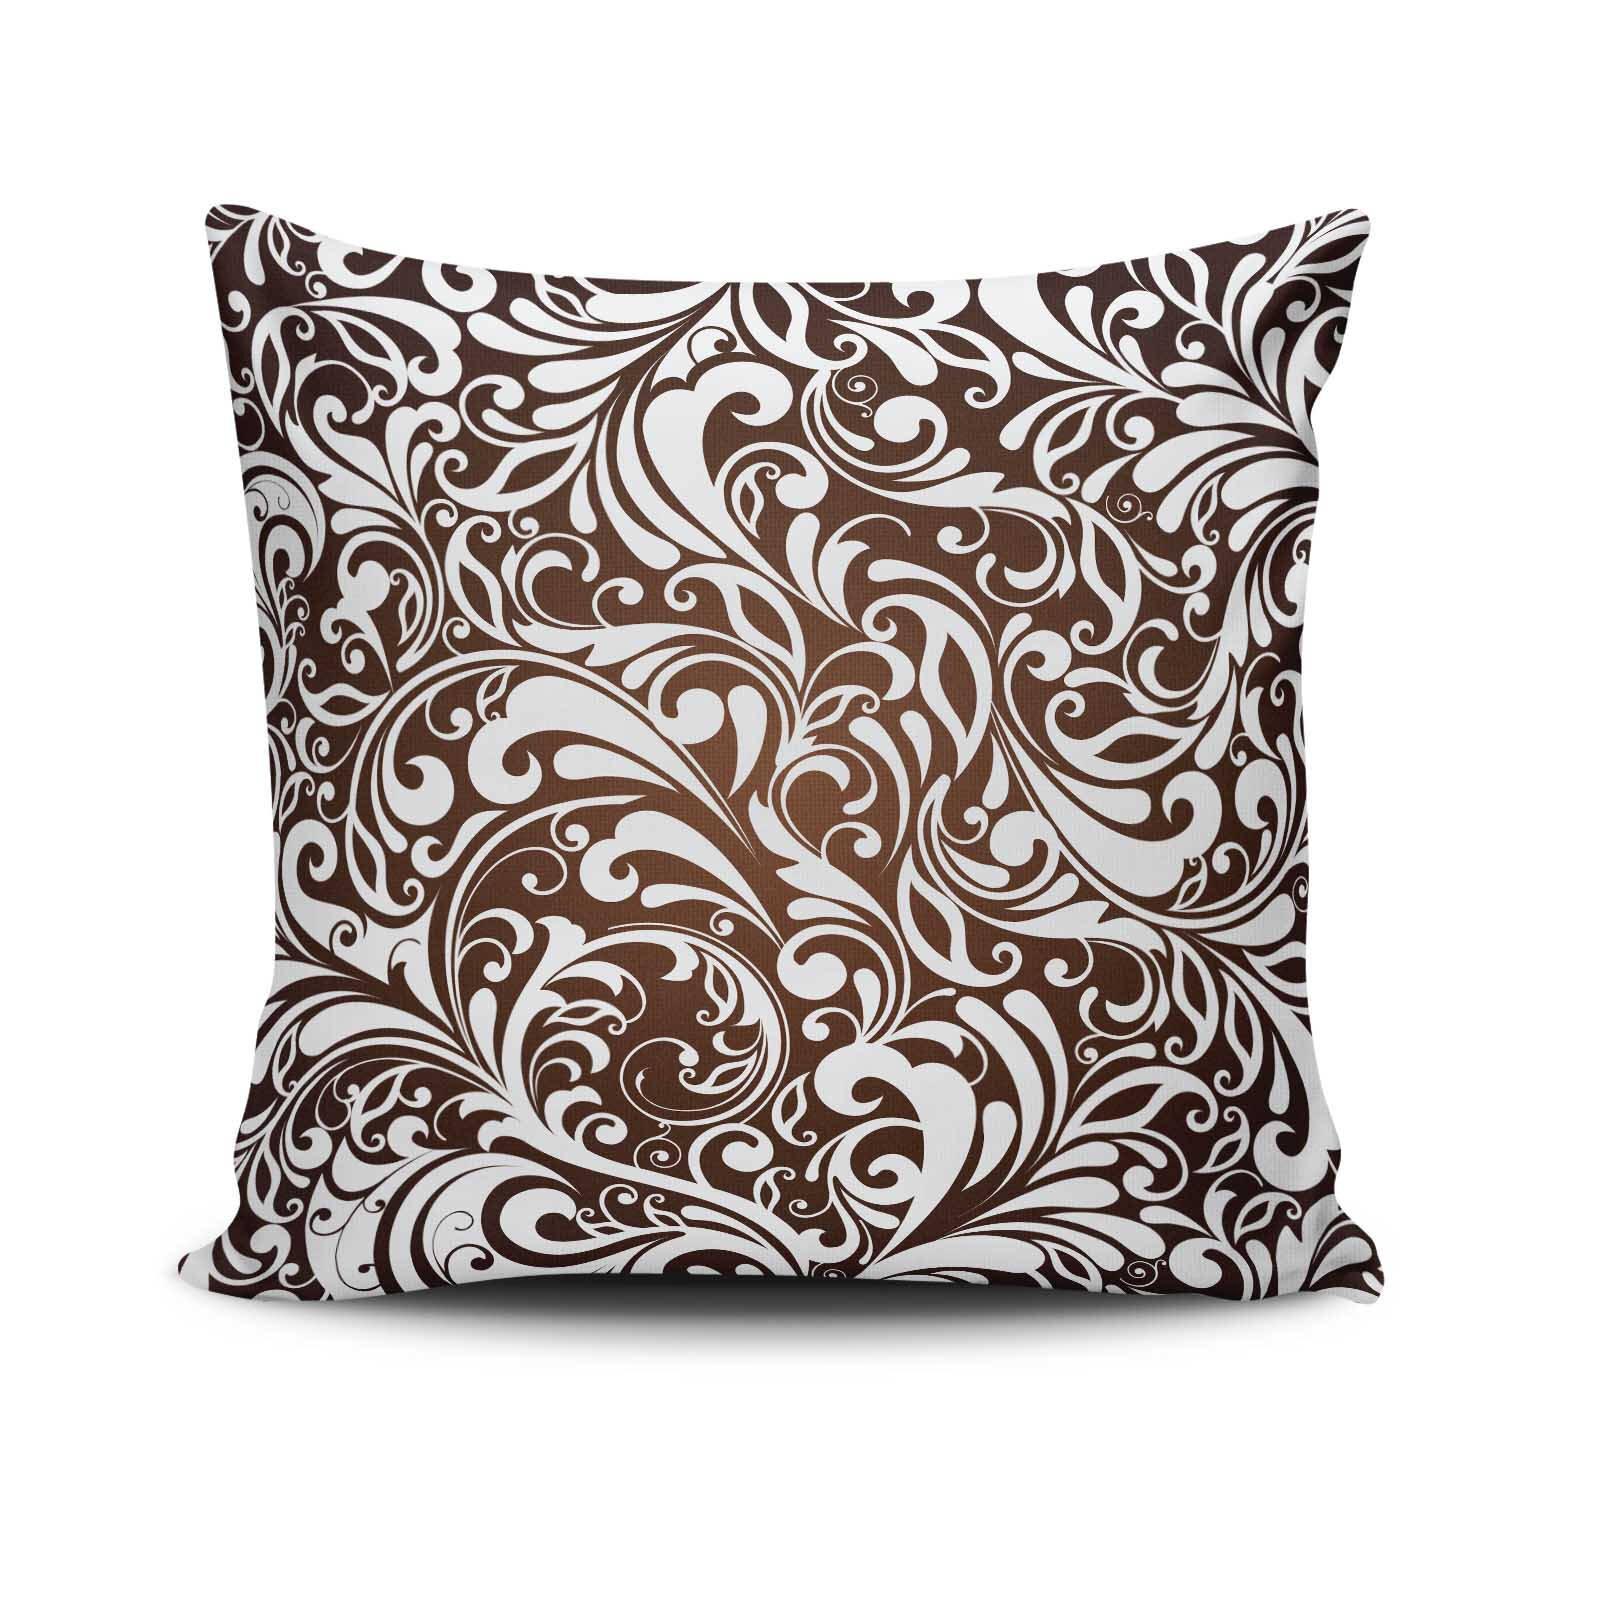 Perna decorativa Spiffy, Dimensiune: 45 x 45 cm, Material exterior: 50% bumbac / 50% poliester 425SPF0116